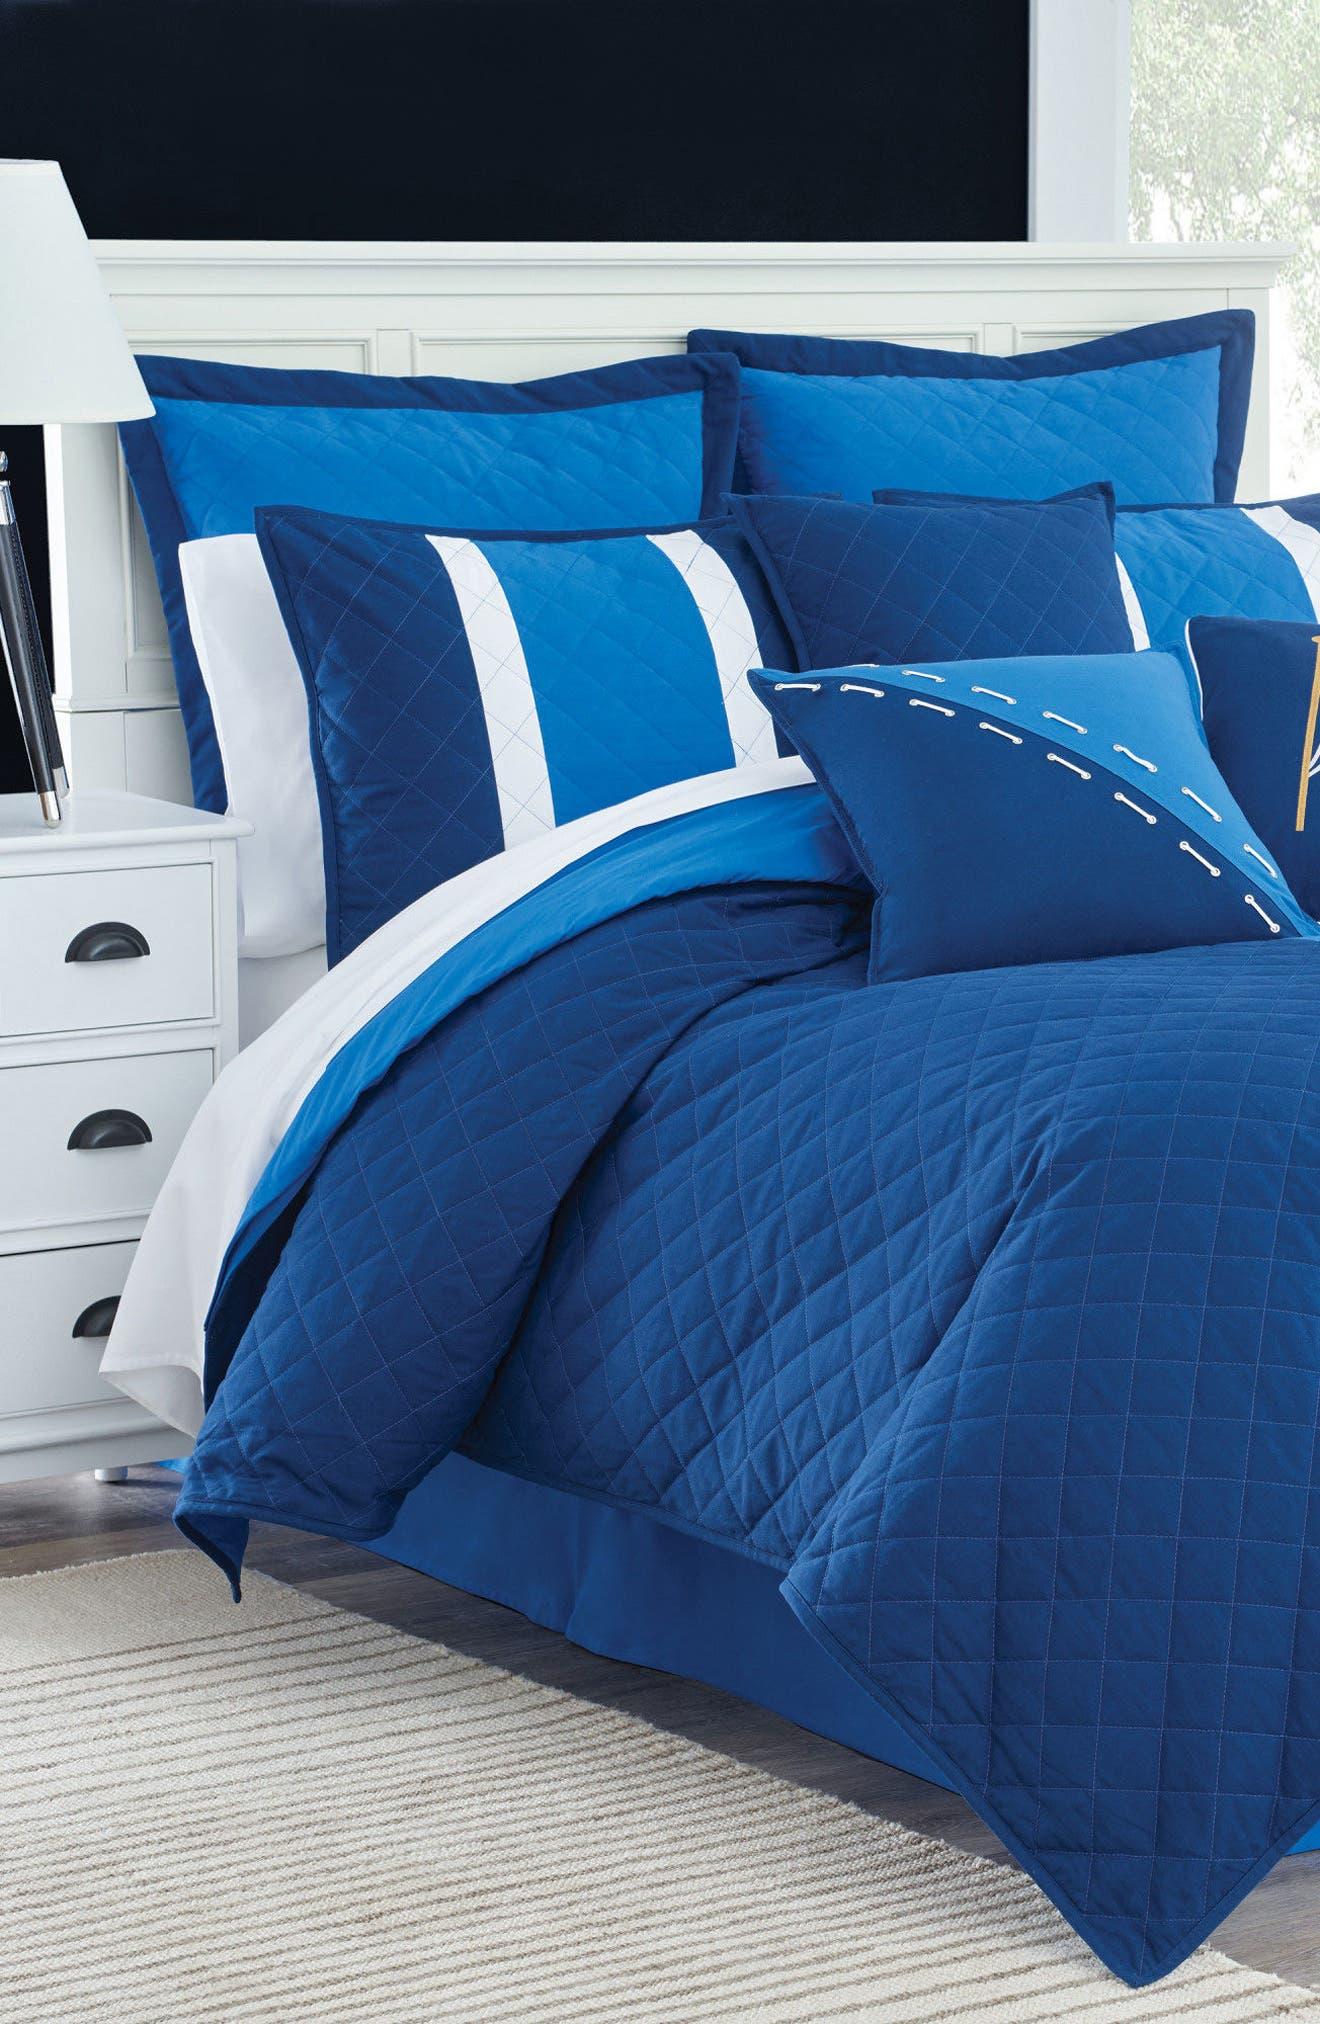 Yacht Club Comforter, Sham & Bed Skirt Set,                             Main thumbnail 1, color,                             400